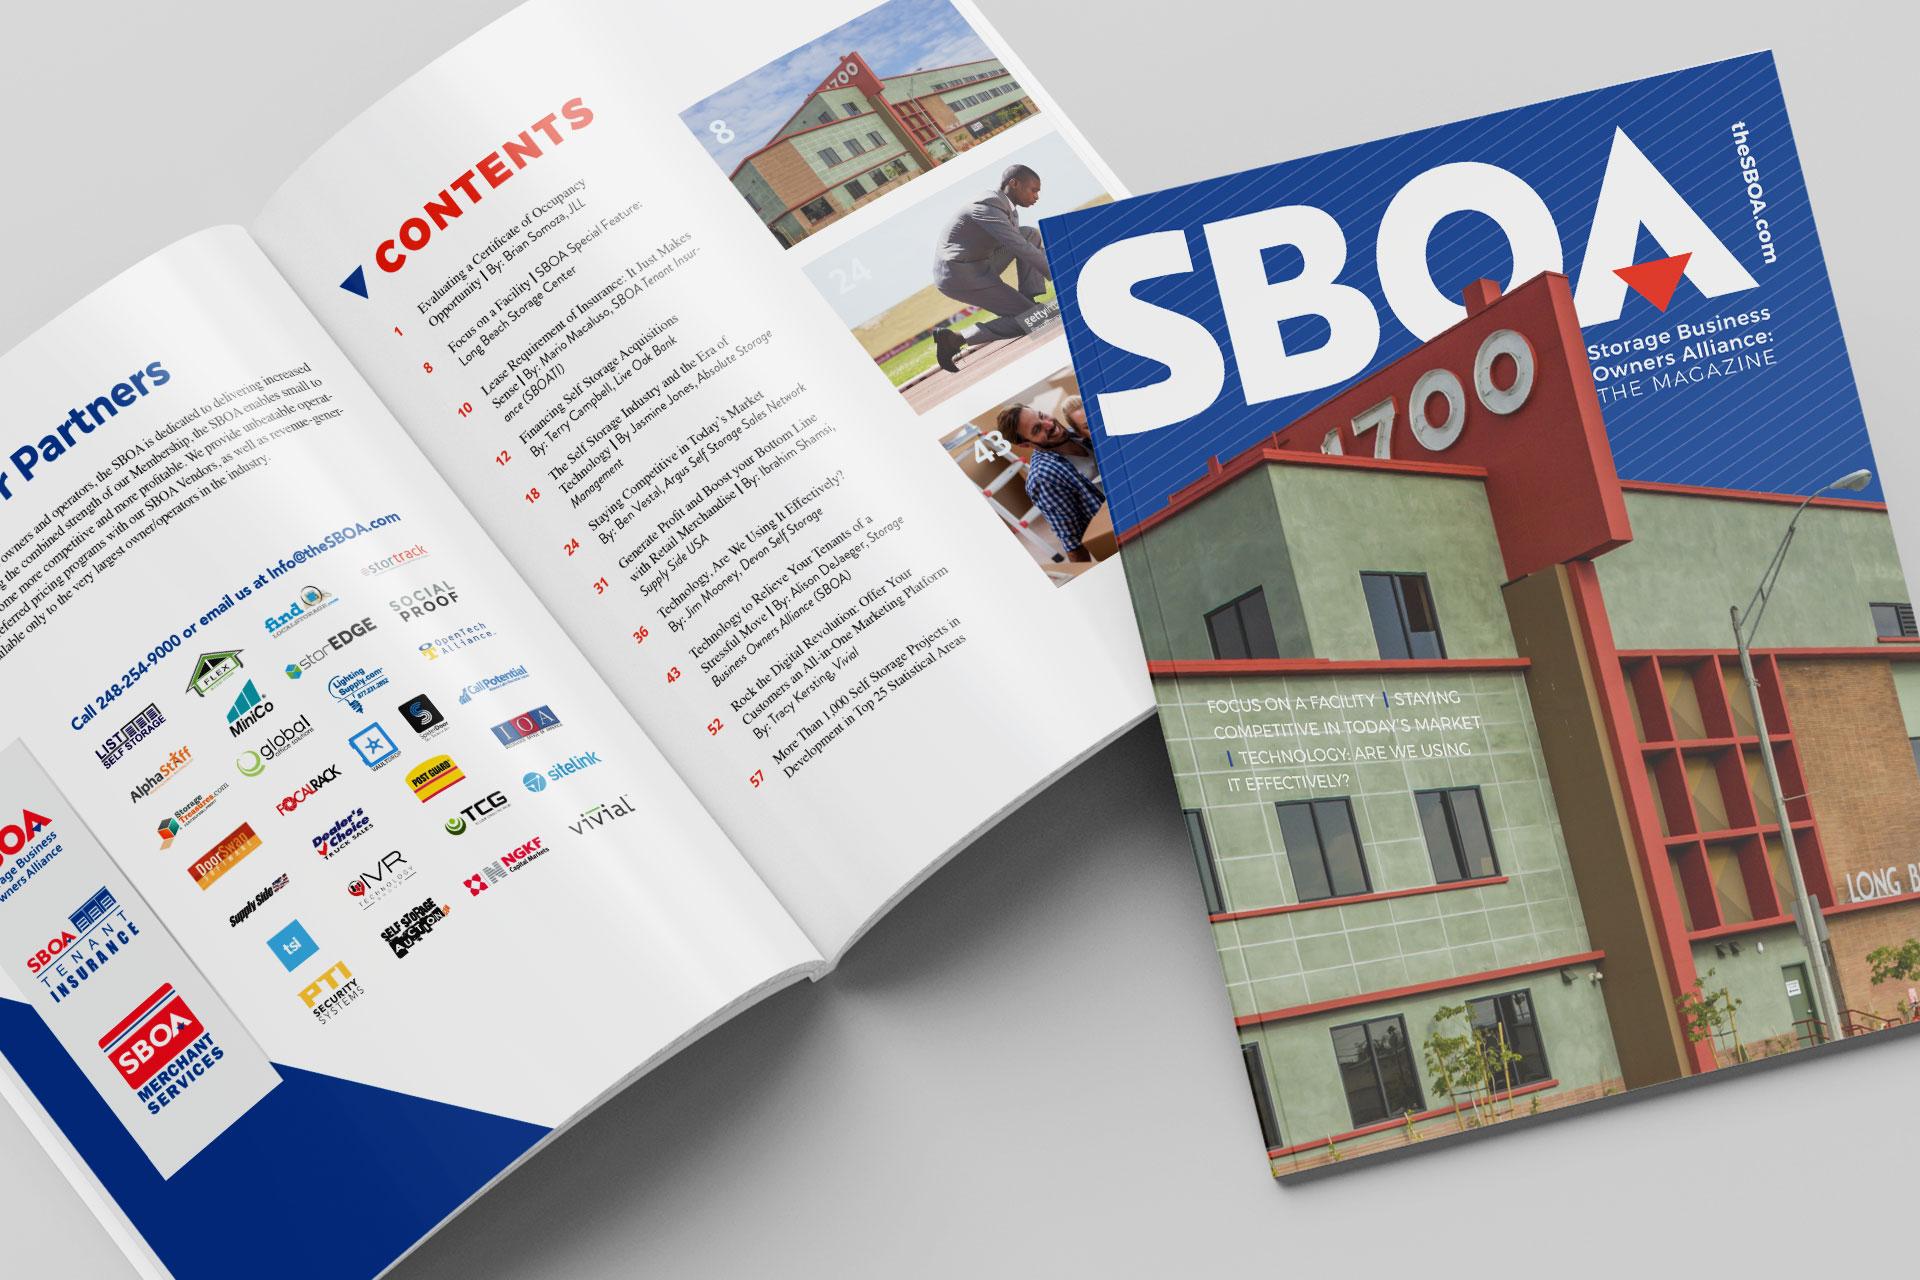 Storage Business Owners Alliance Magazine